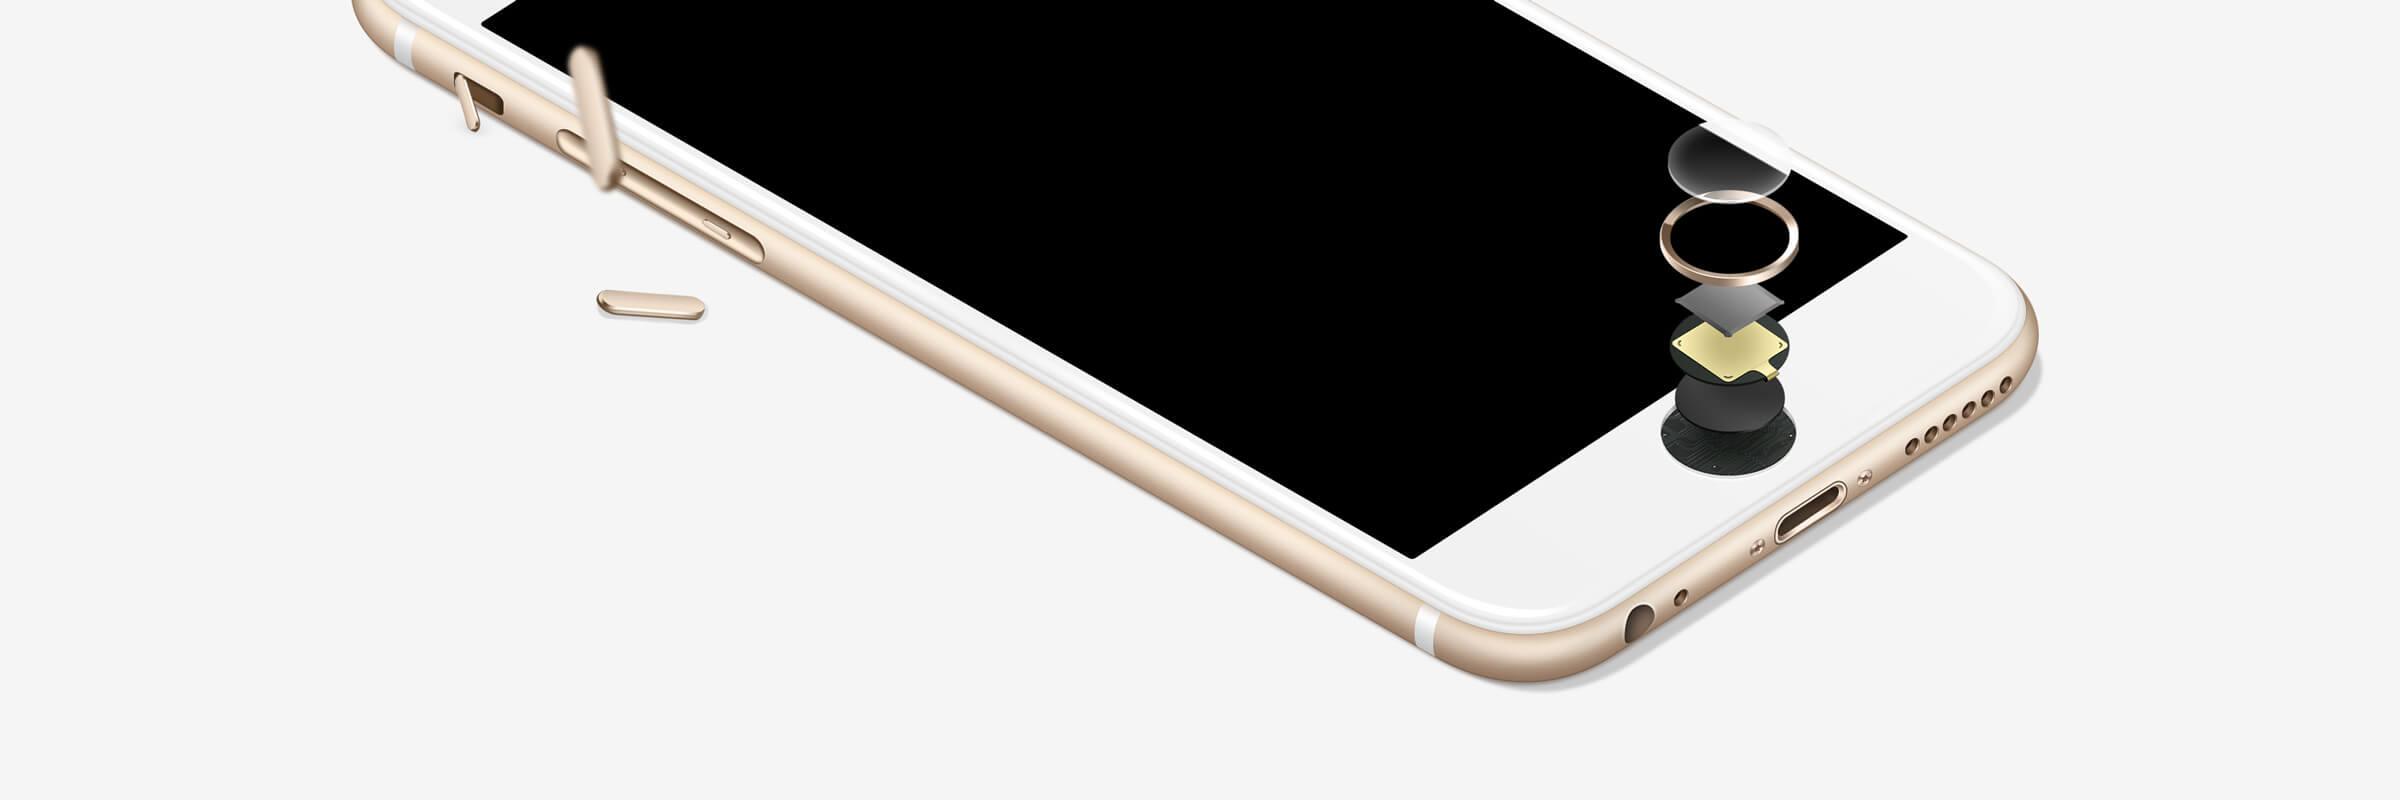 iphone mygtuku remontas